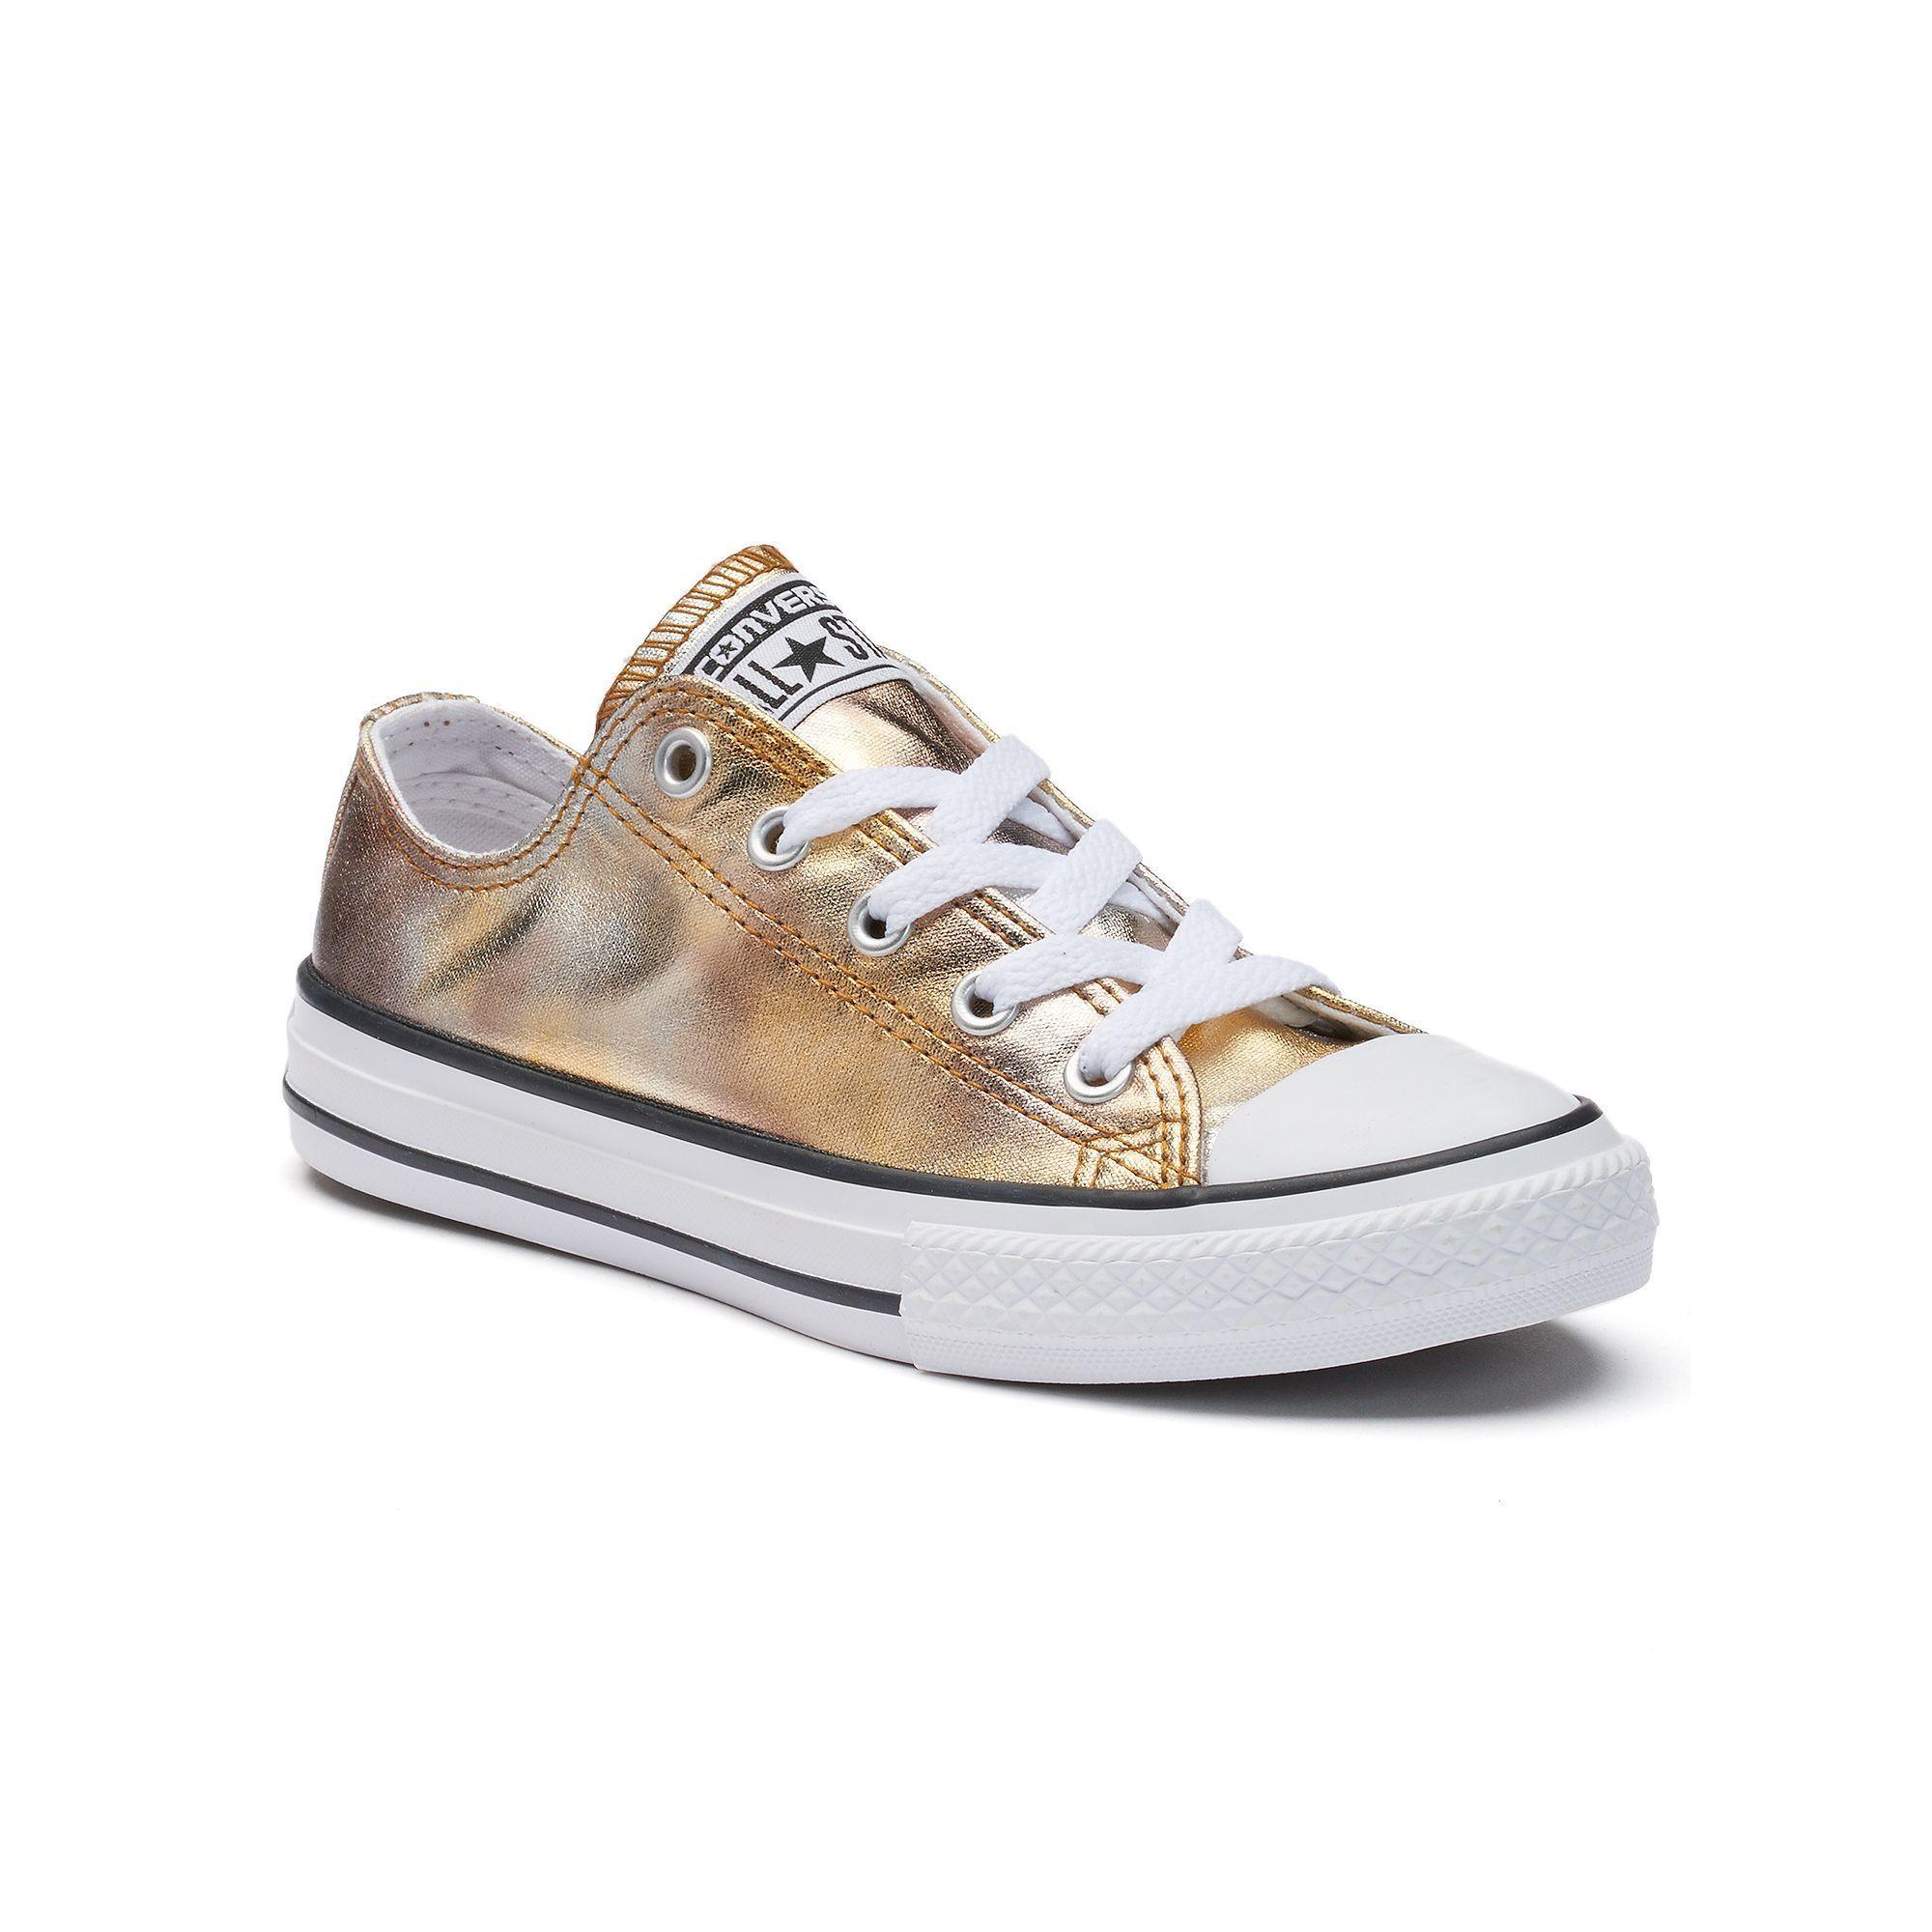 Nike Blazer Mid Suede Sneakers Damen Cru Pourri